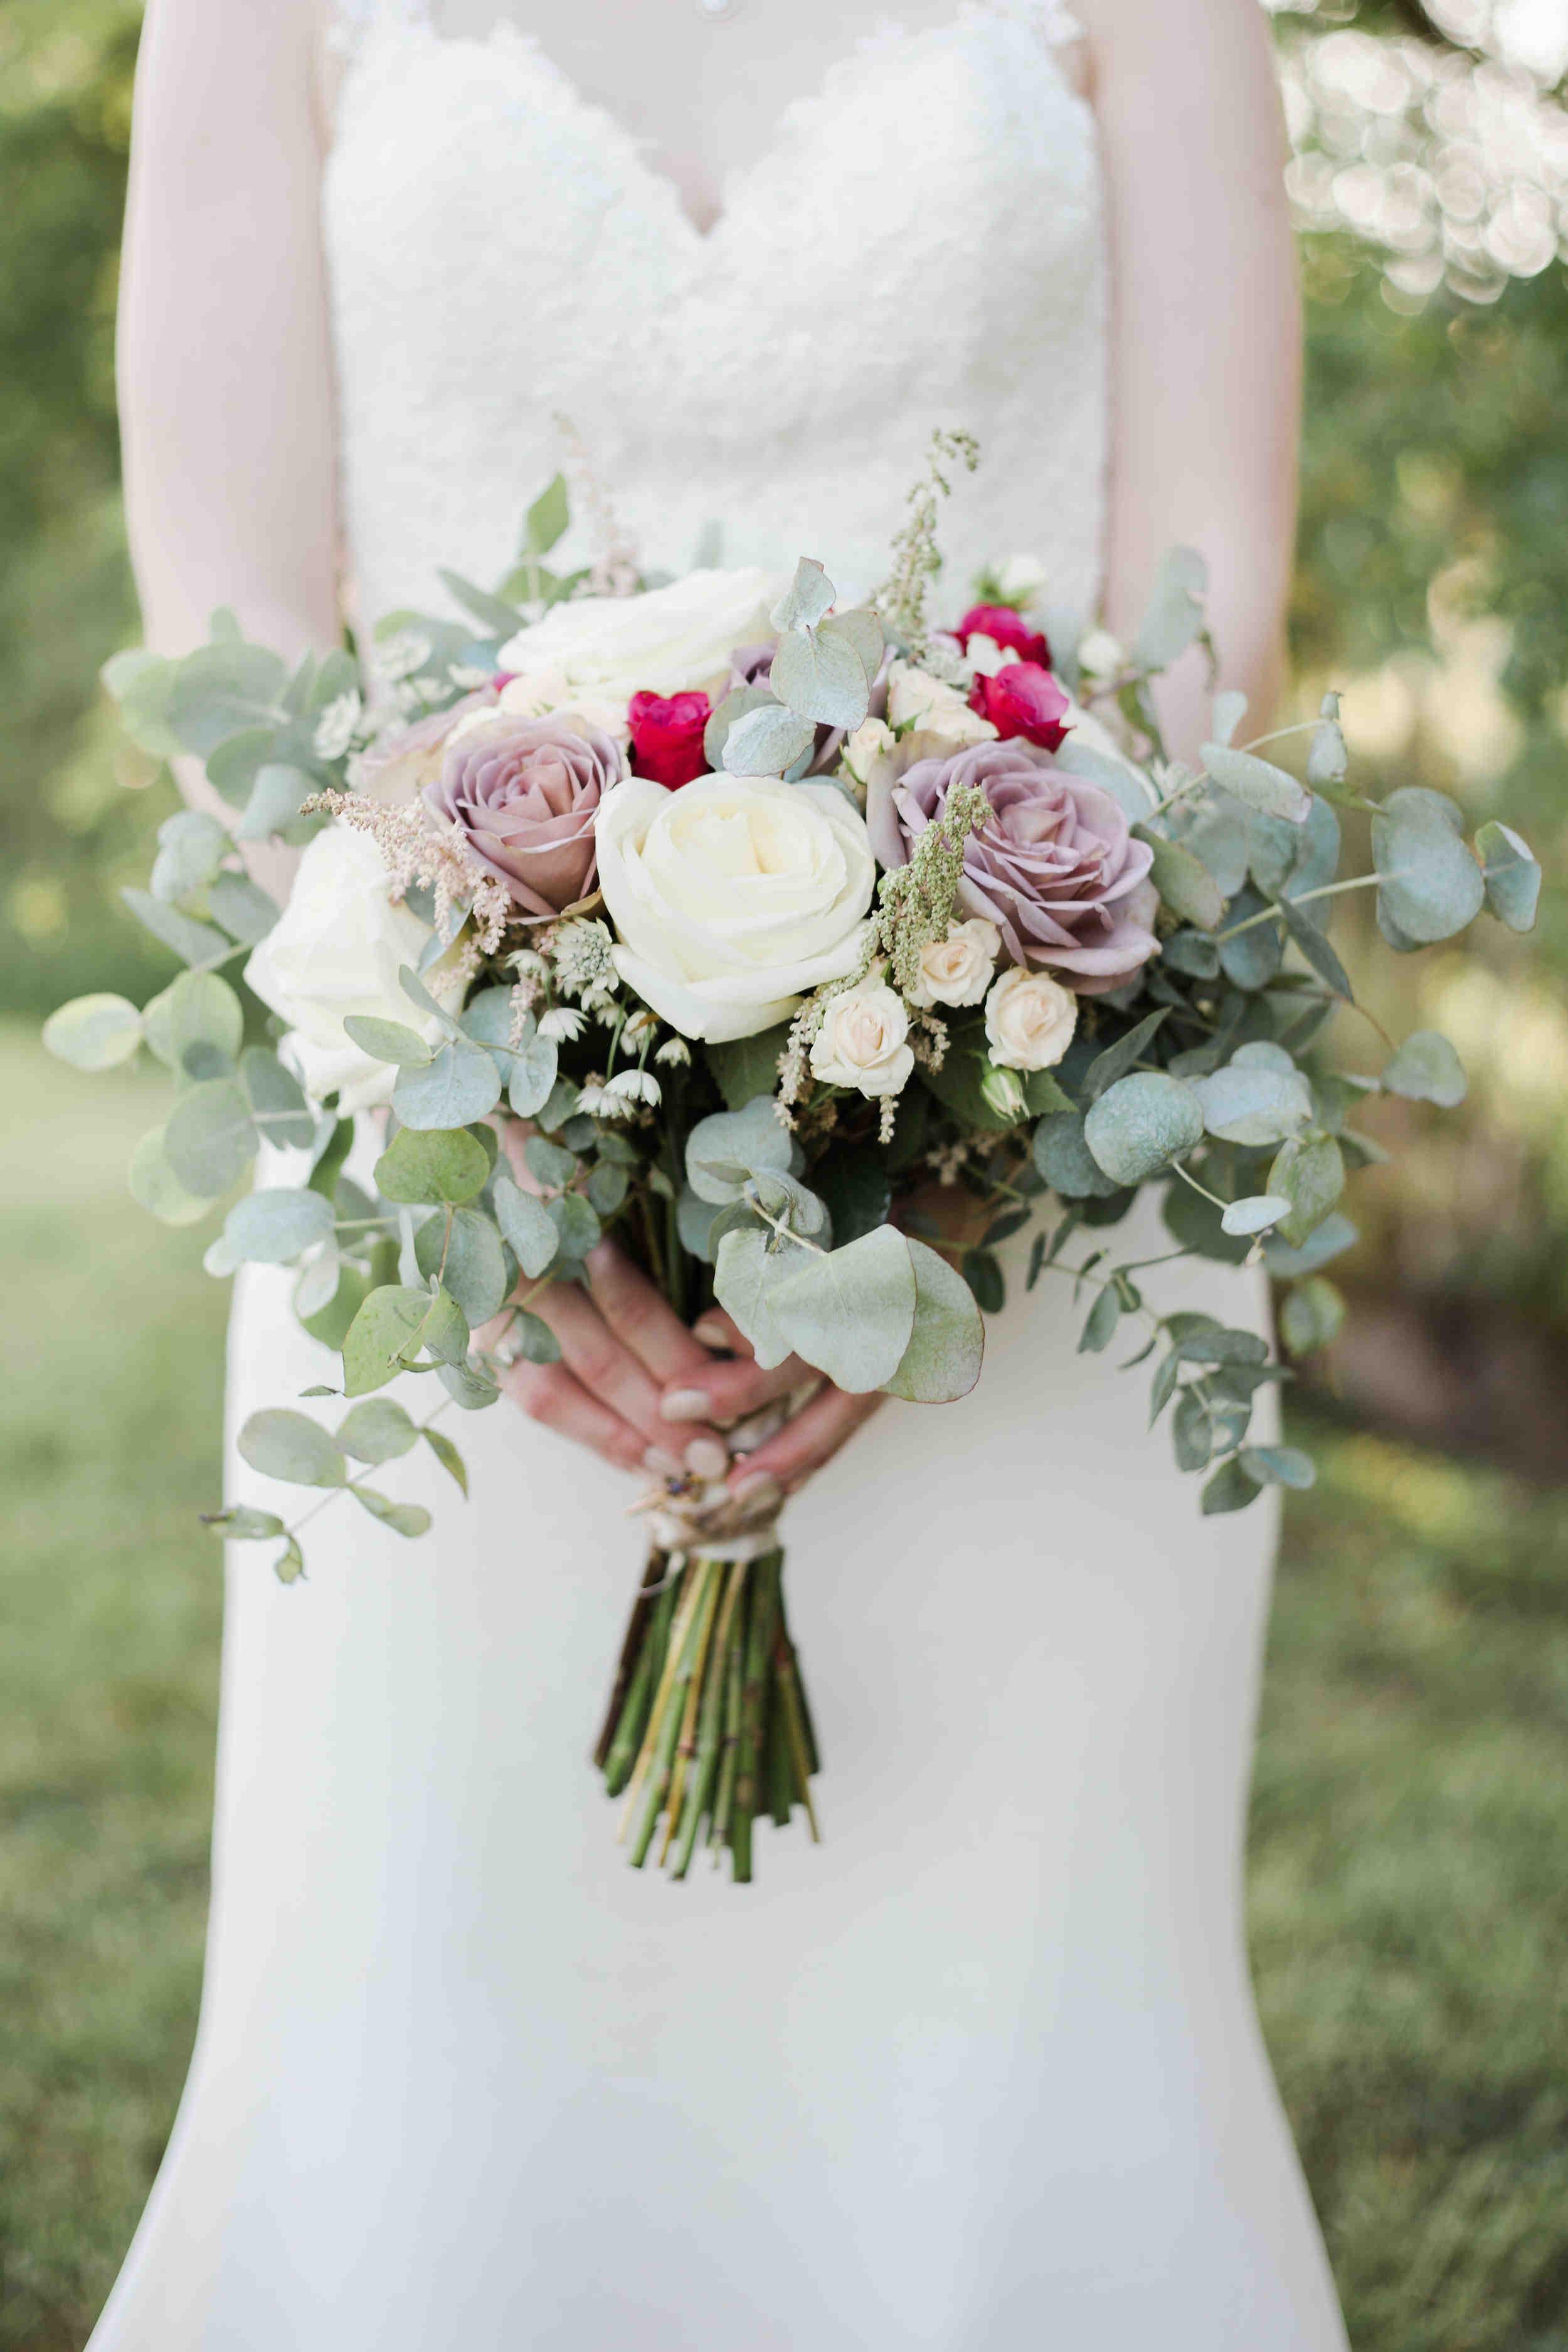 Modern_Stylish_Wedding_at_Swallows_Nest_Barn1285